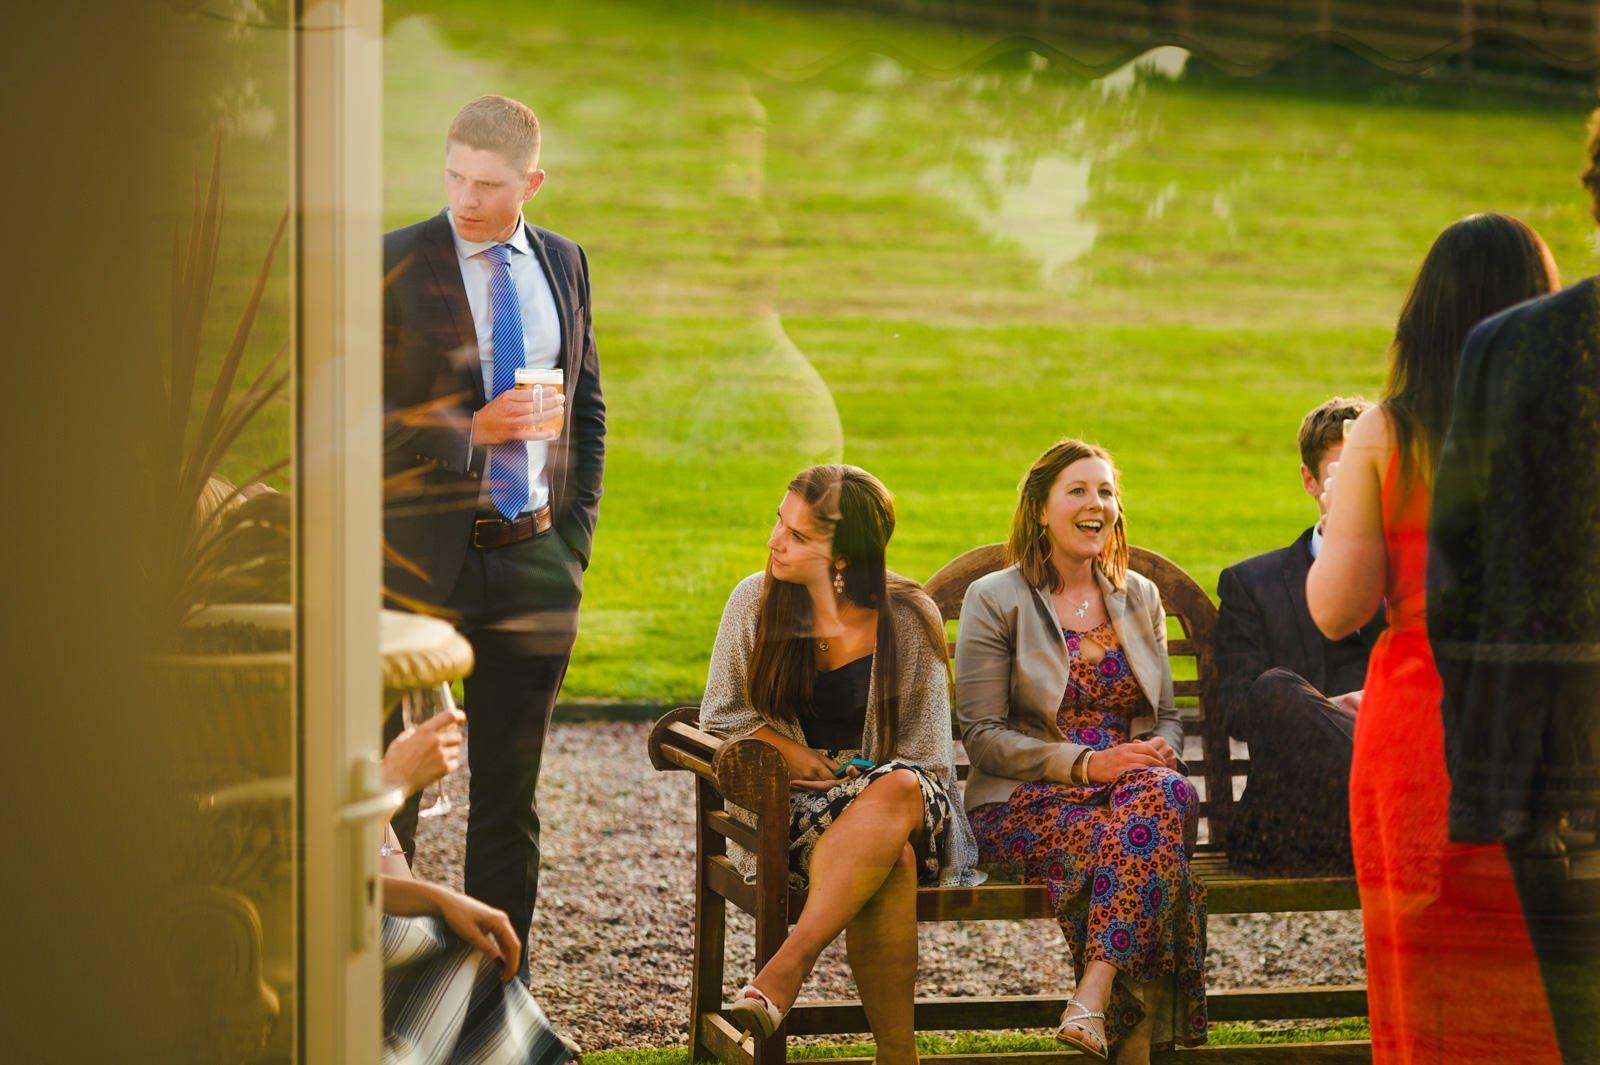 Millers Of Netley wedding, Dorrington, Shrewsbury | Emma + Ben 61